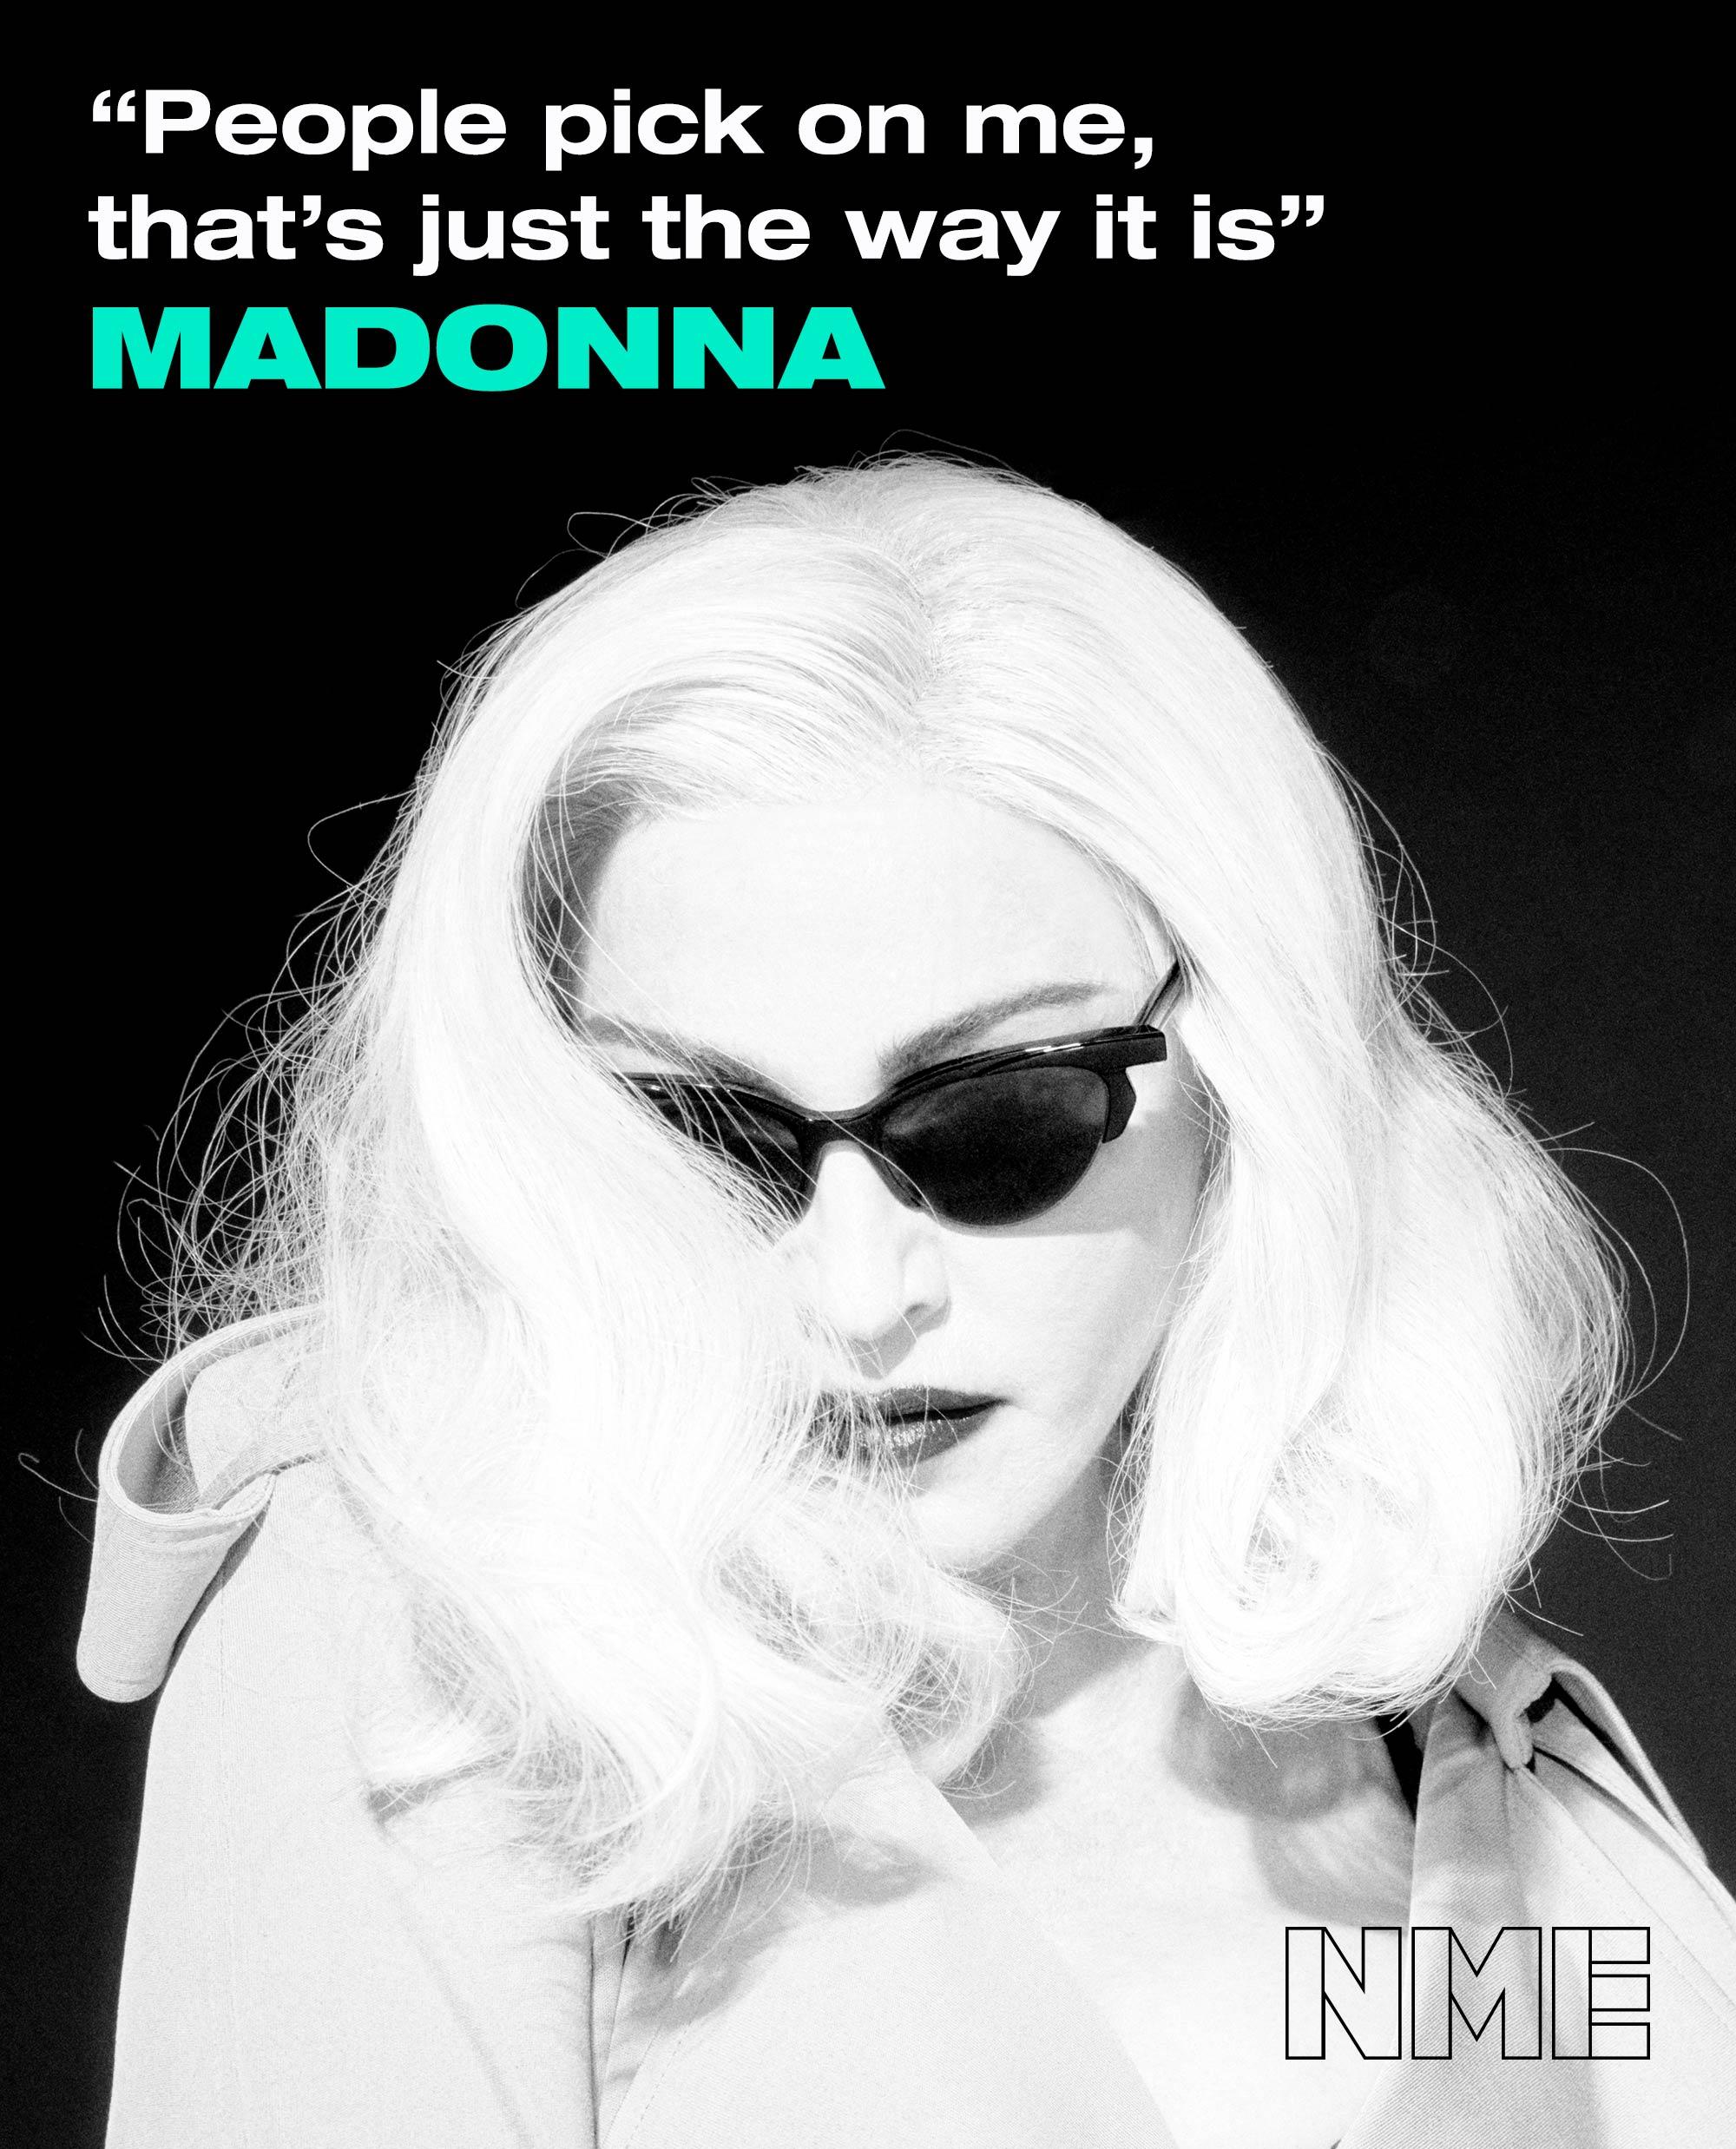 Madonna-Quote-1.jpg